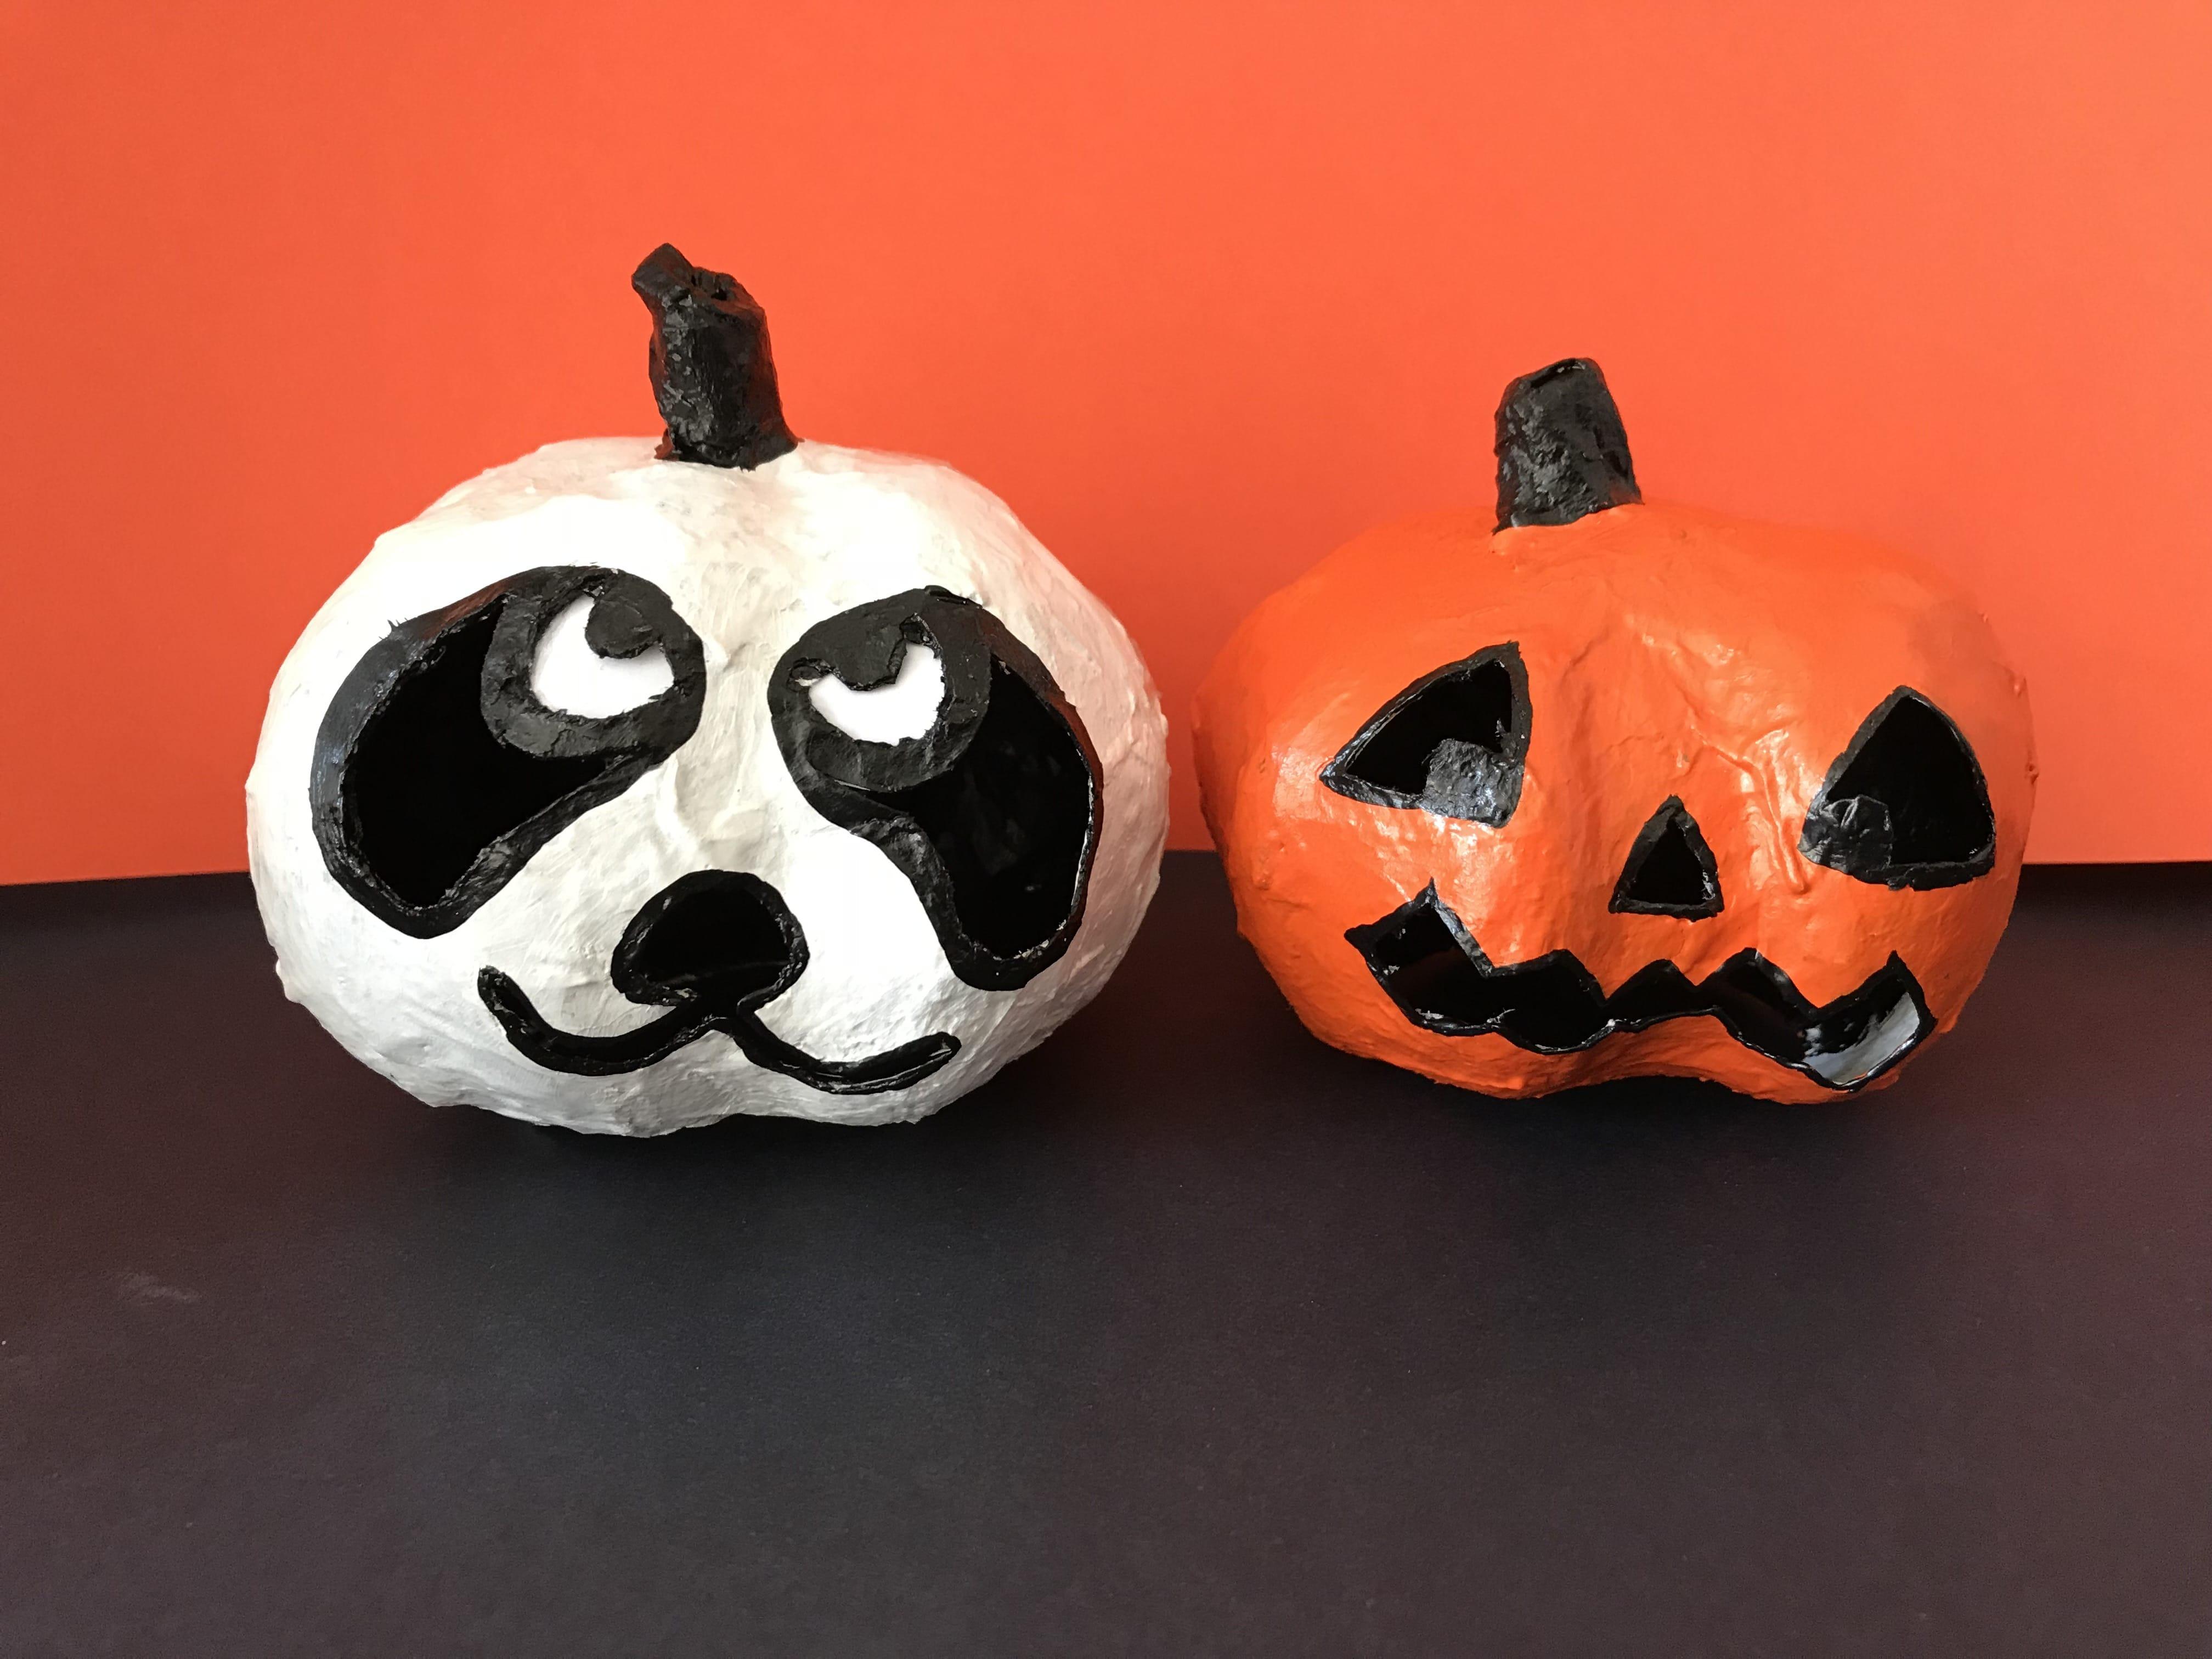 kuerbis-halloween-aus-mehlkleister-basteln-upcycling-kinder-diy-selbermachen